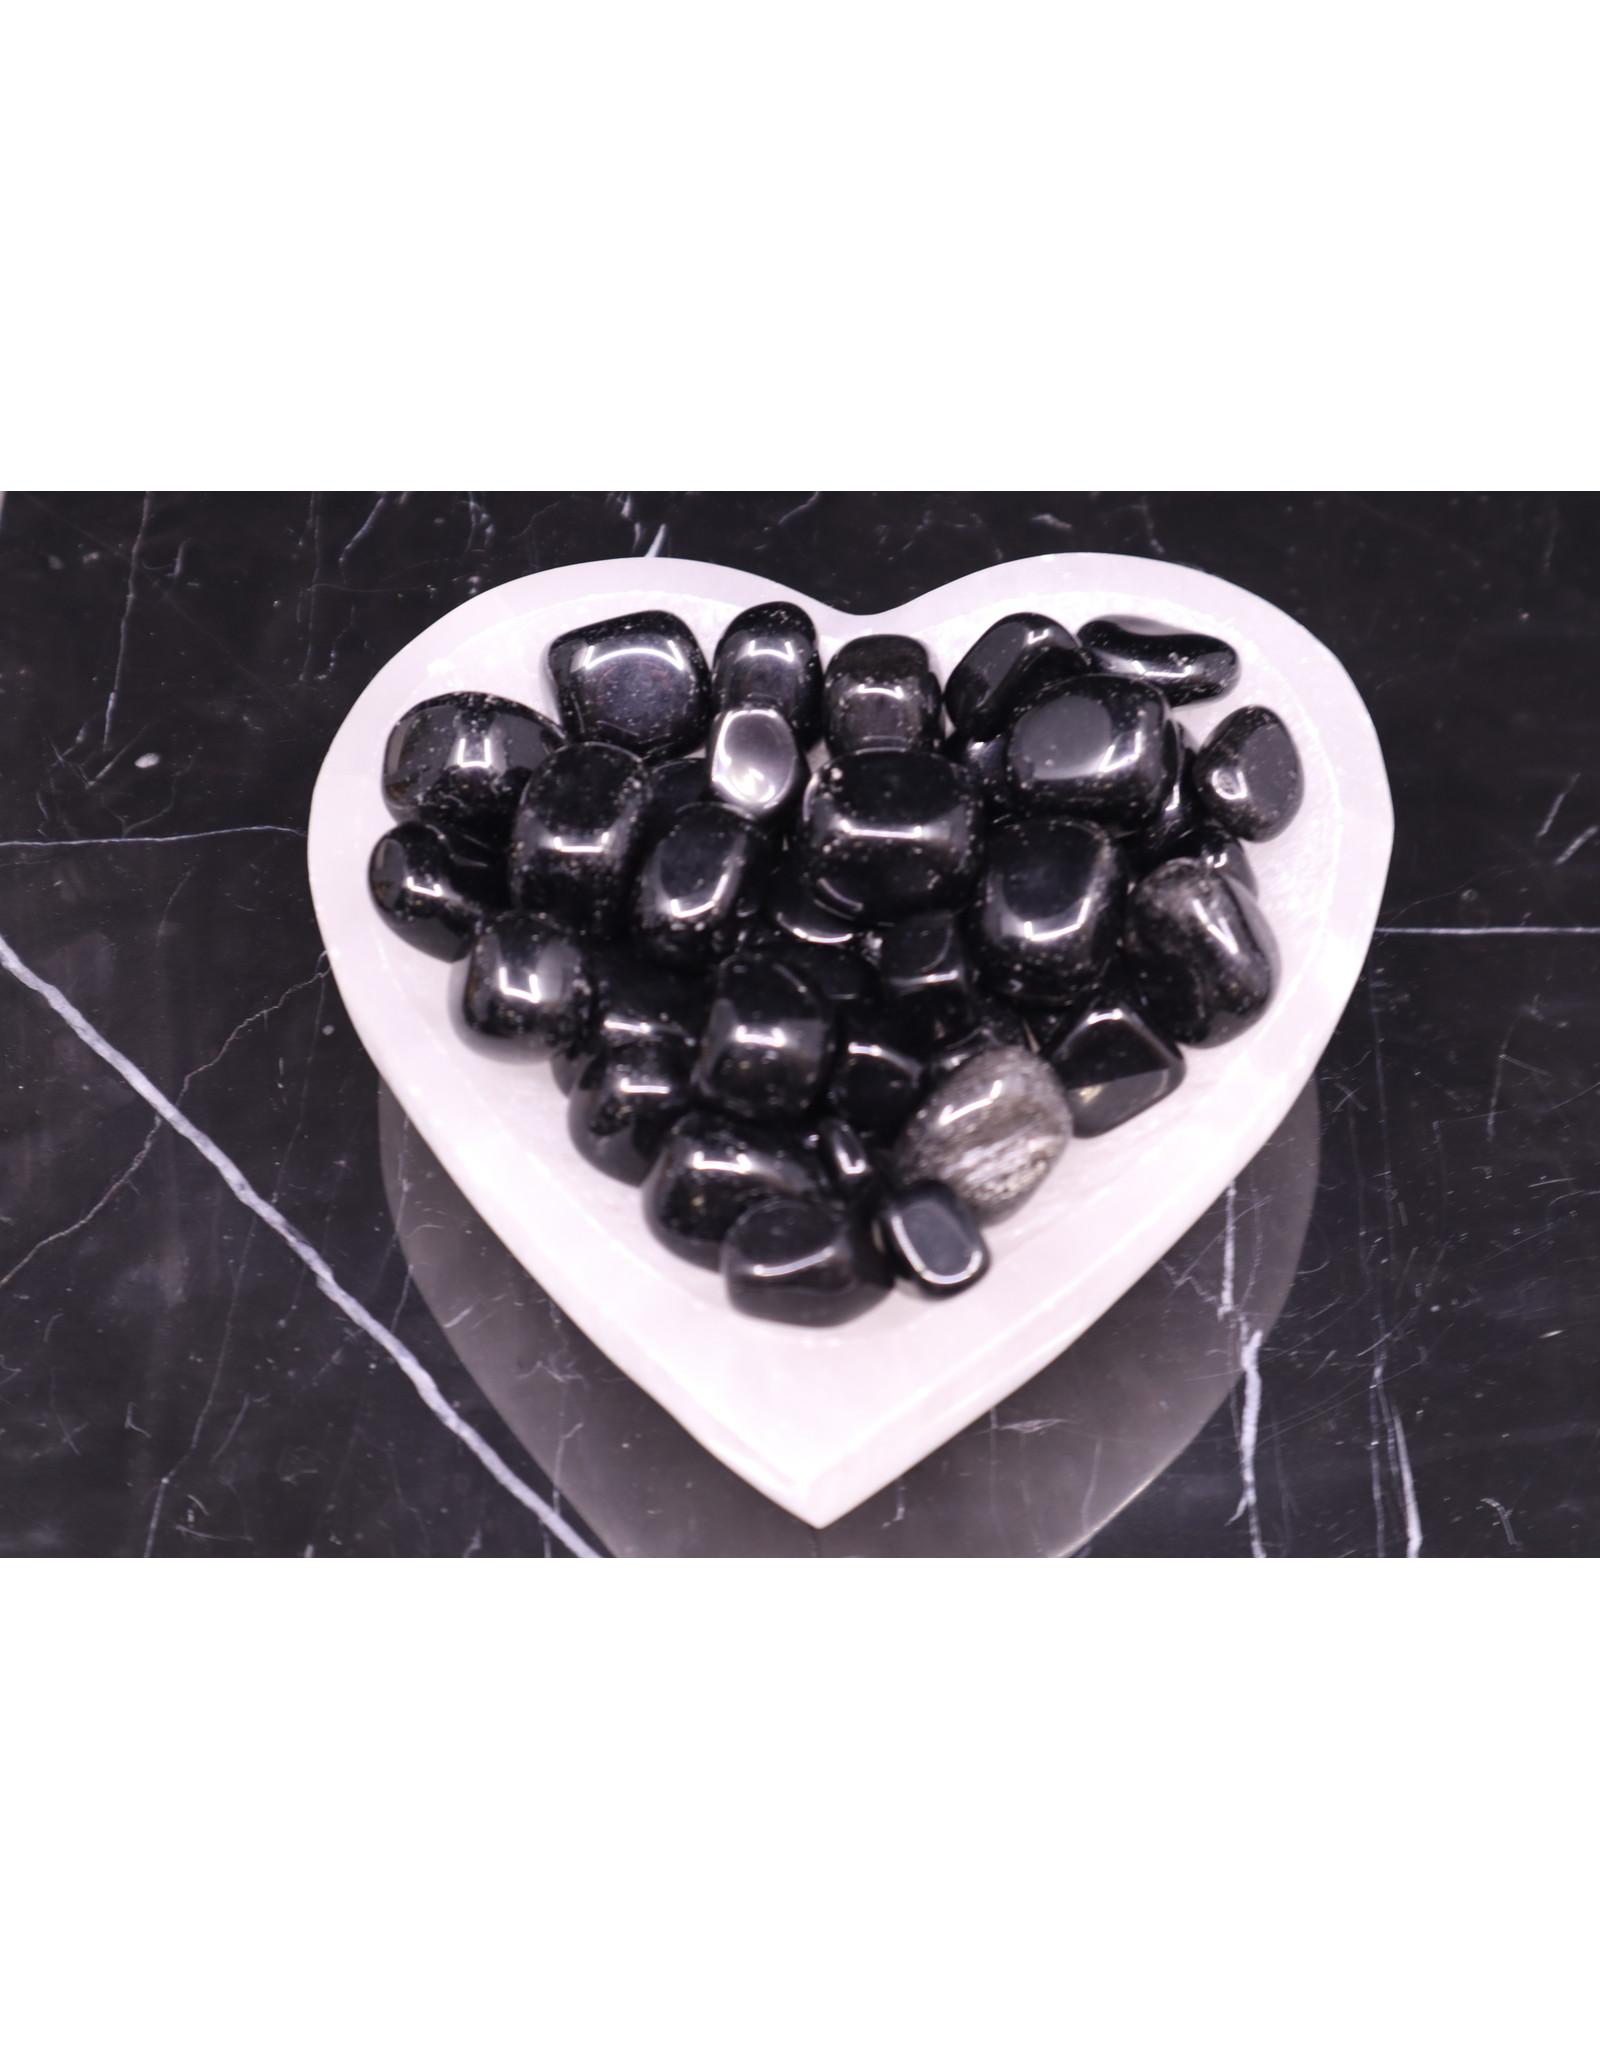 Black Obsidian - Tumbled